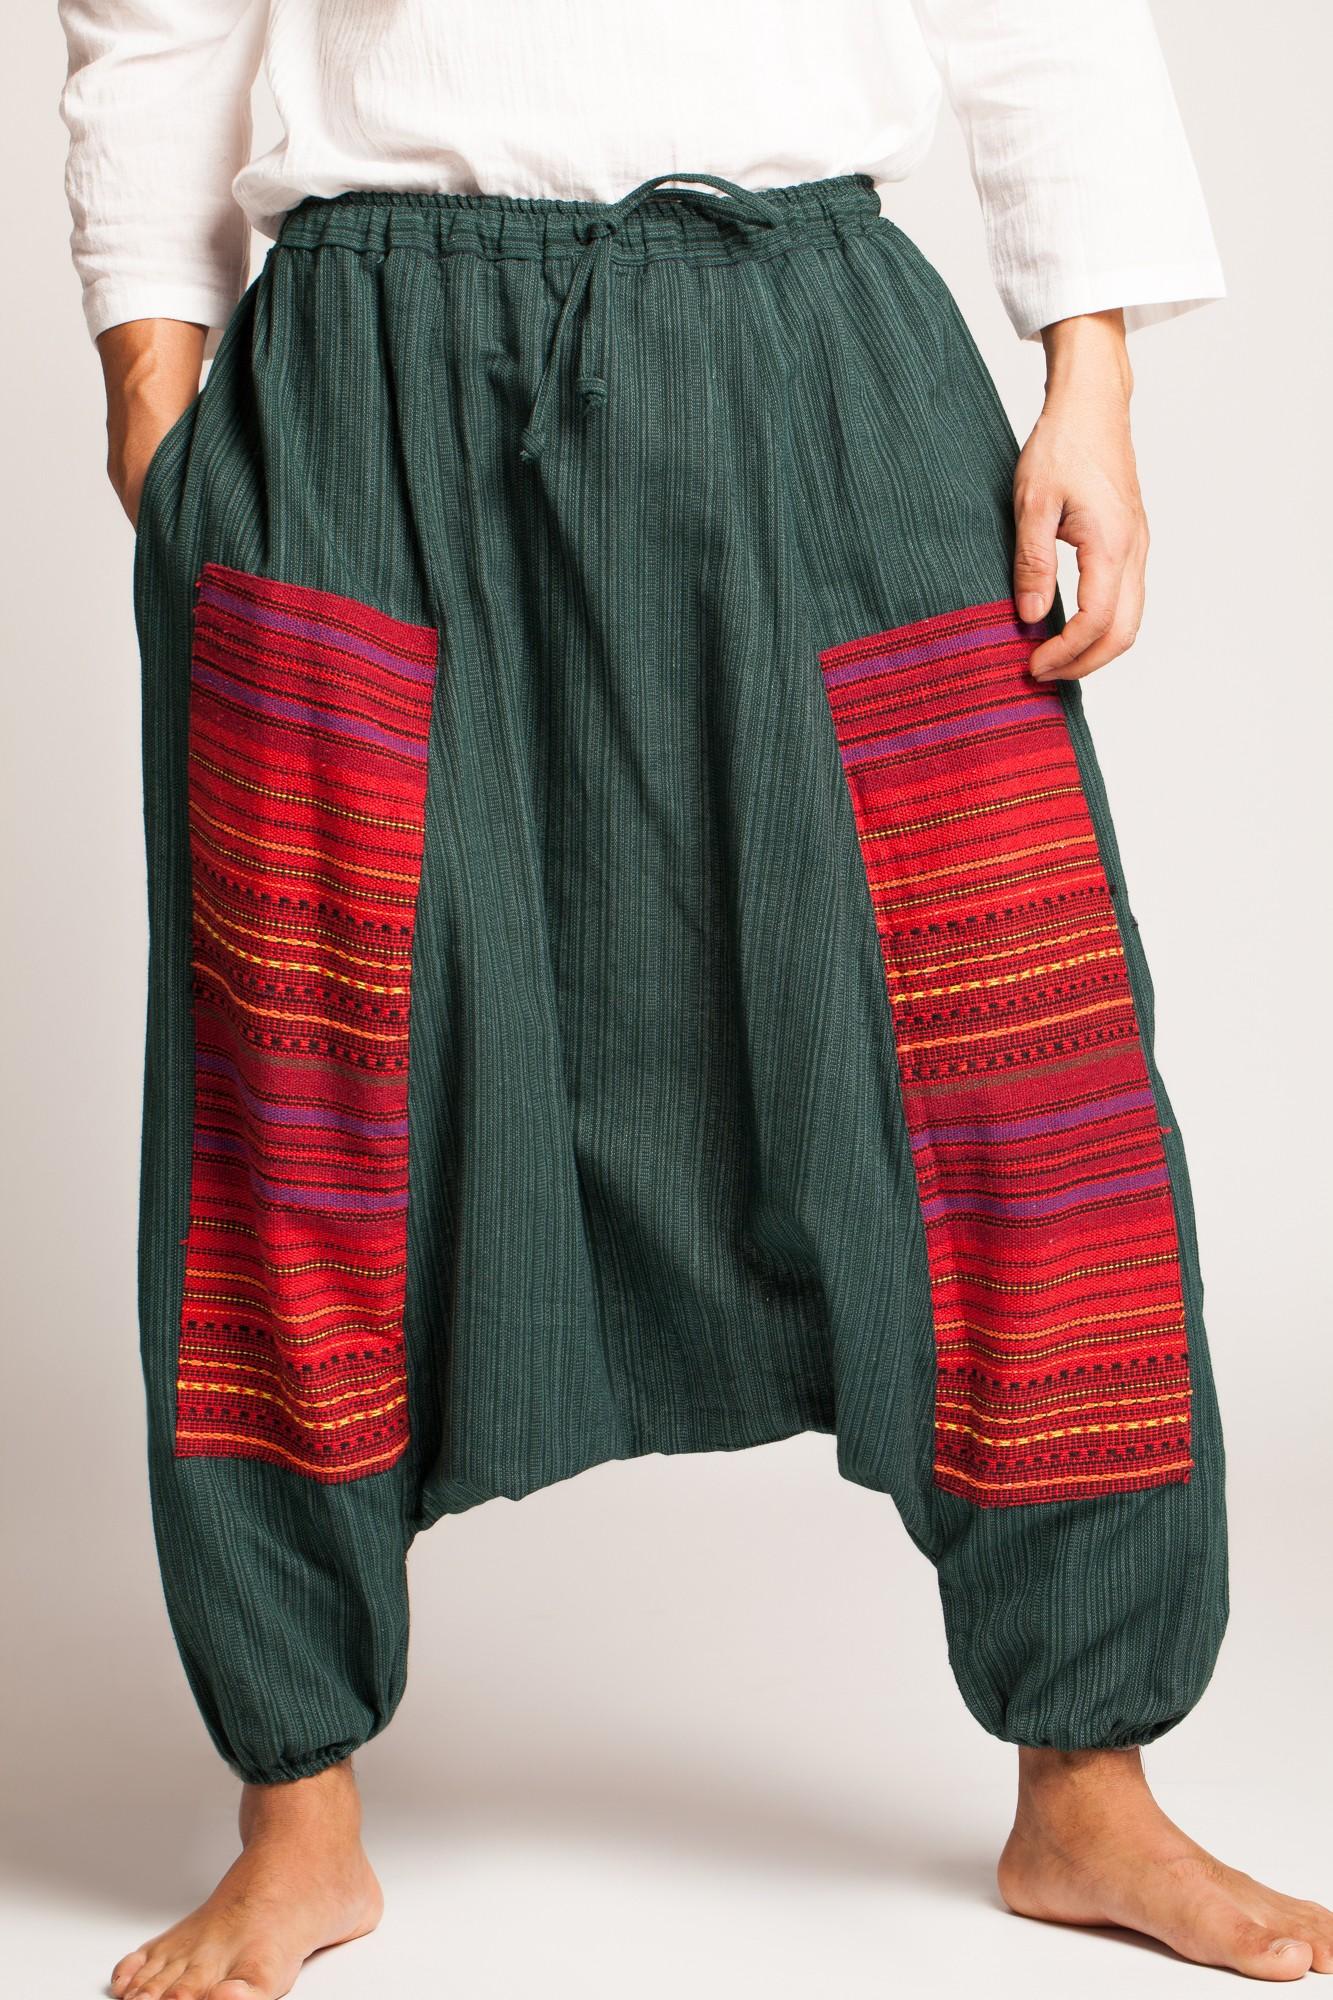 Salvari verde inchis texturat cu motive etnice